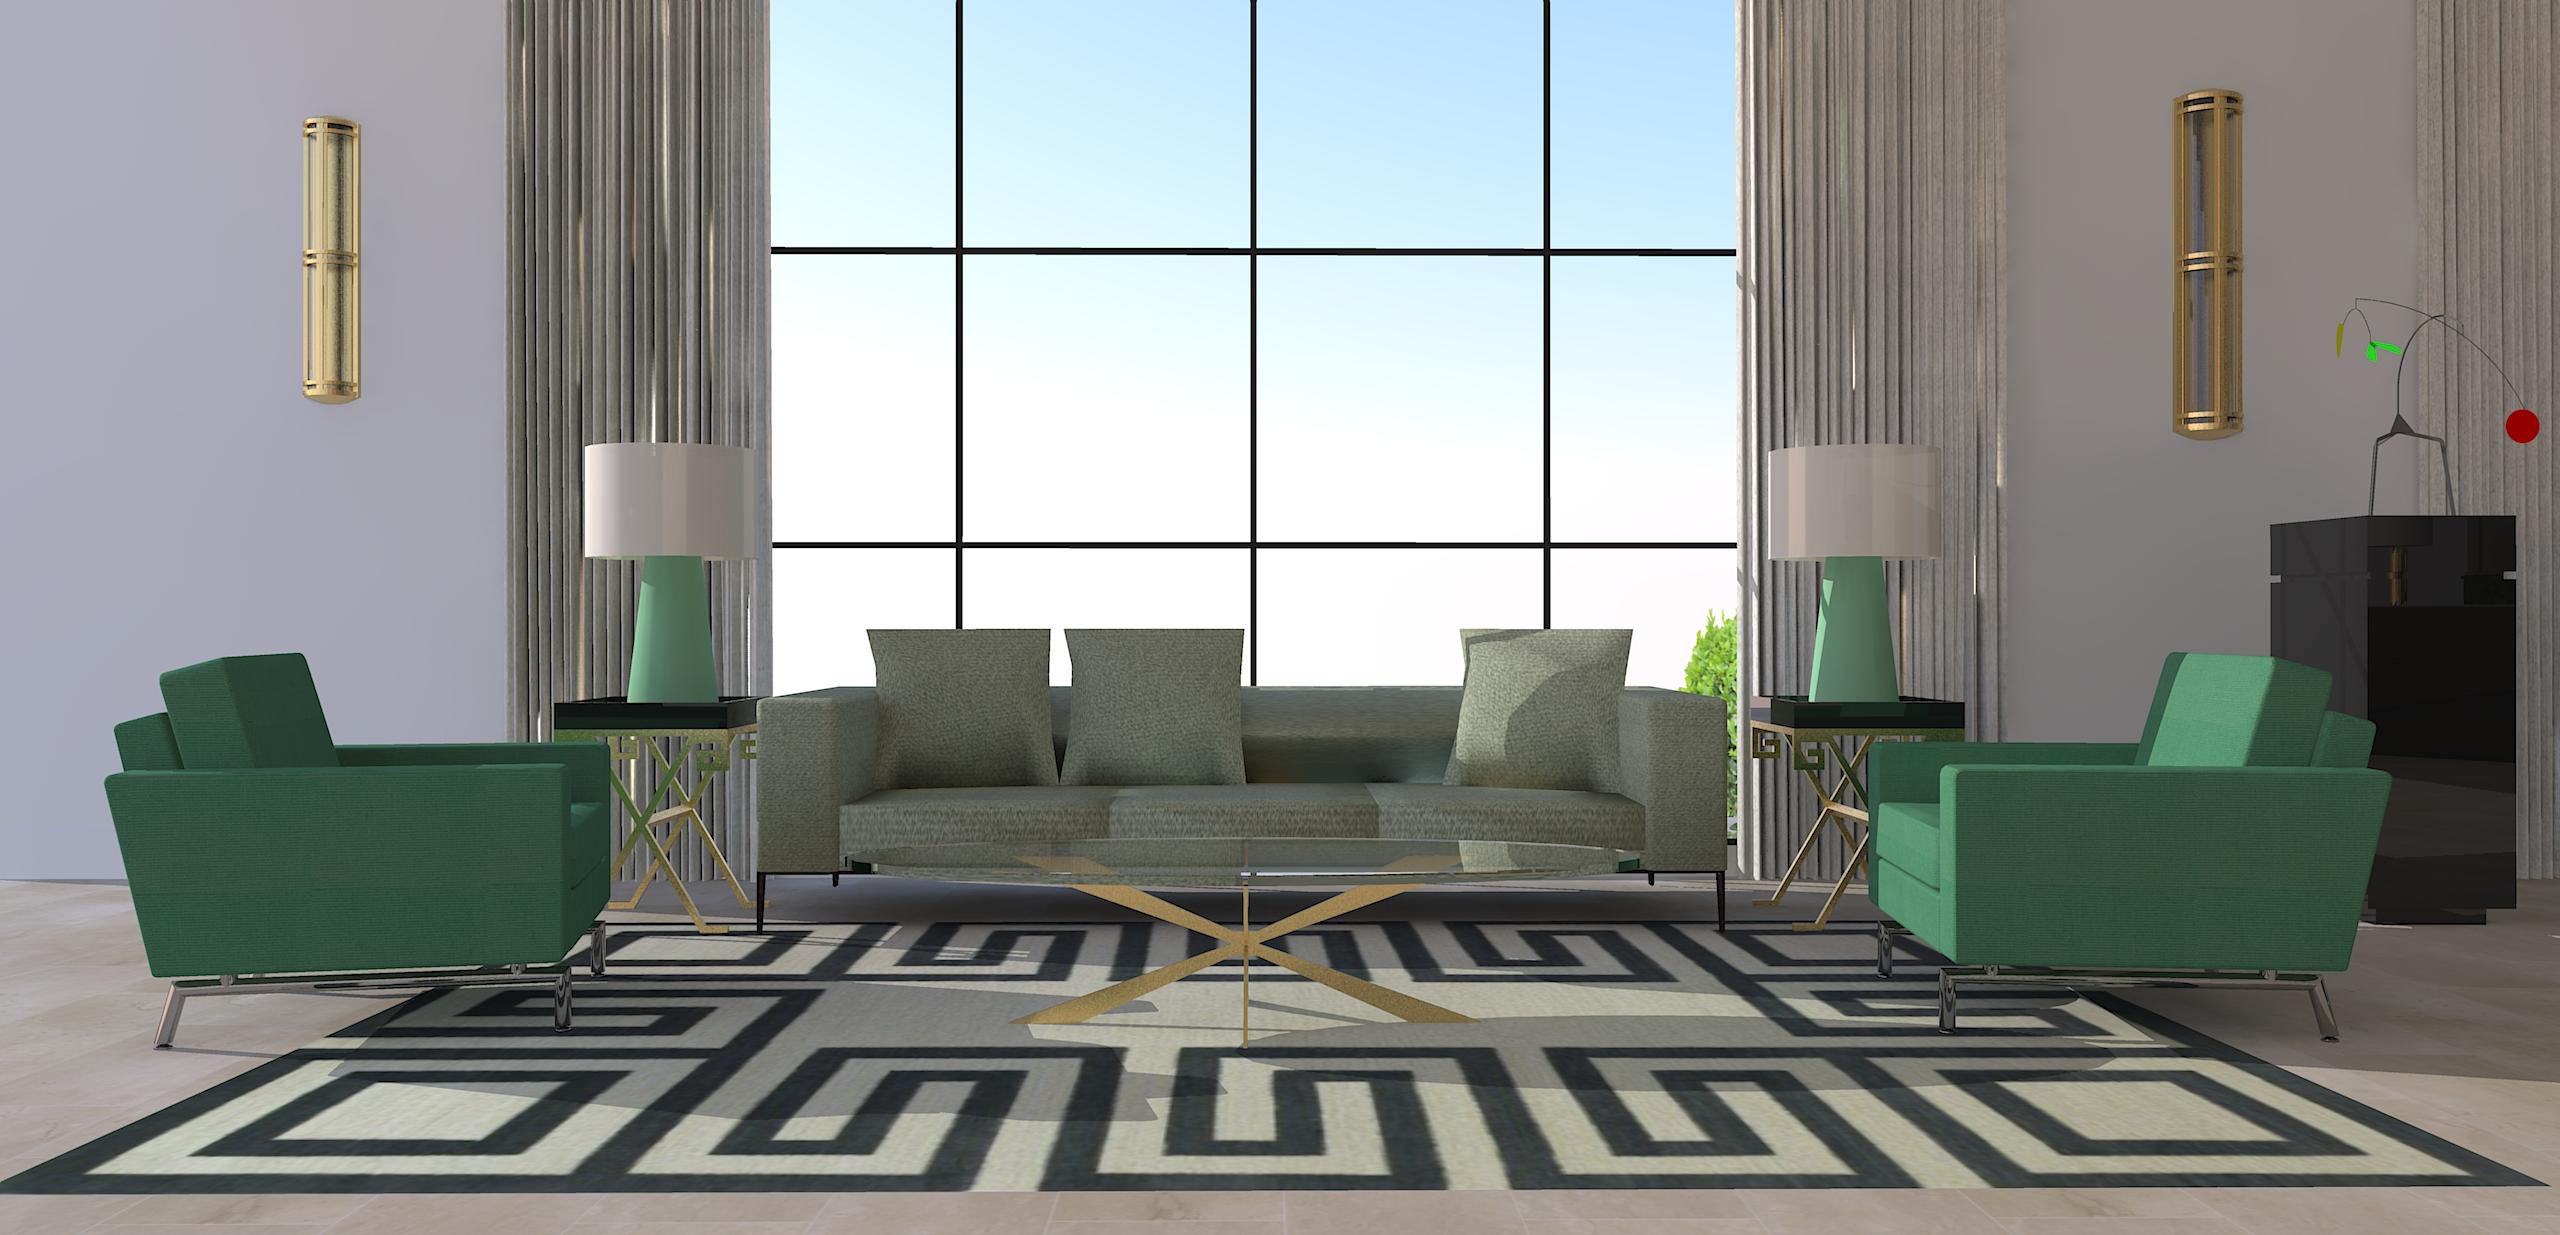 Hotel lobby design nicol s sieber for Design hotel madrid